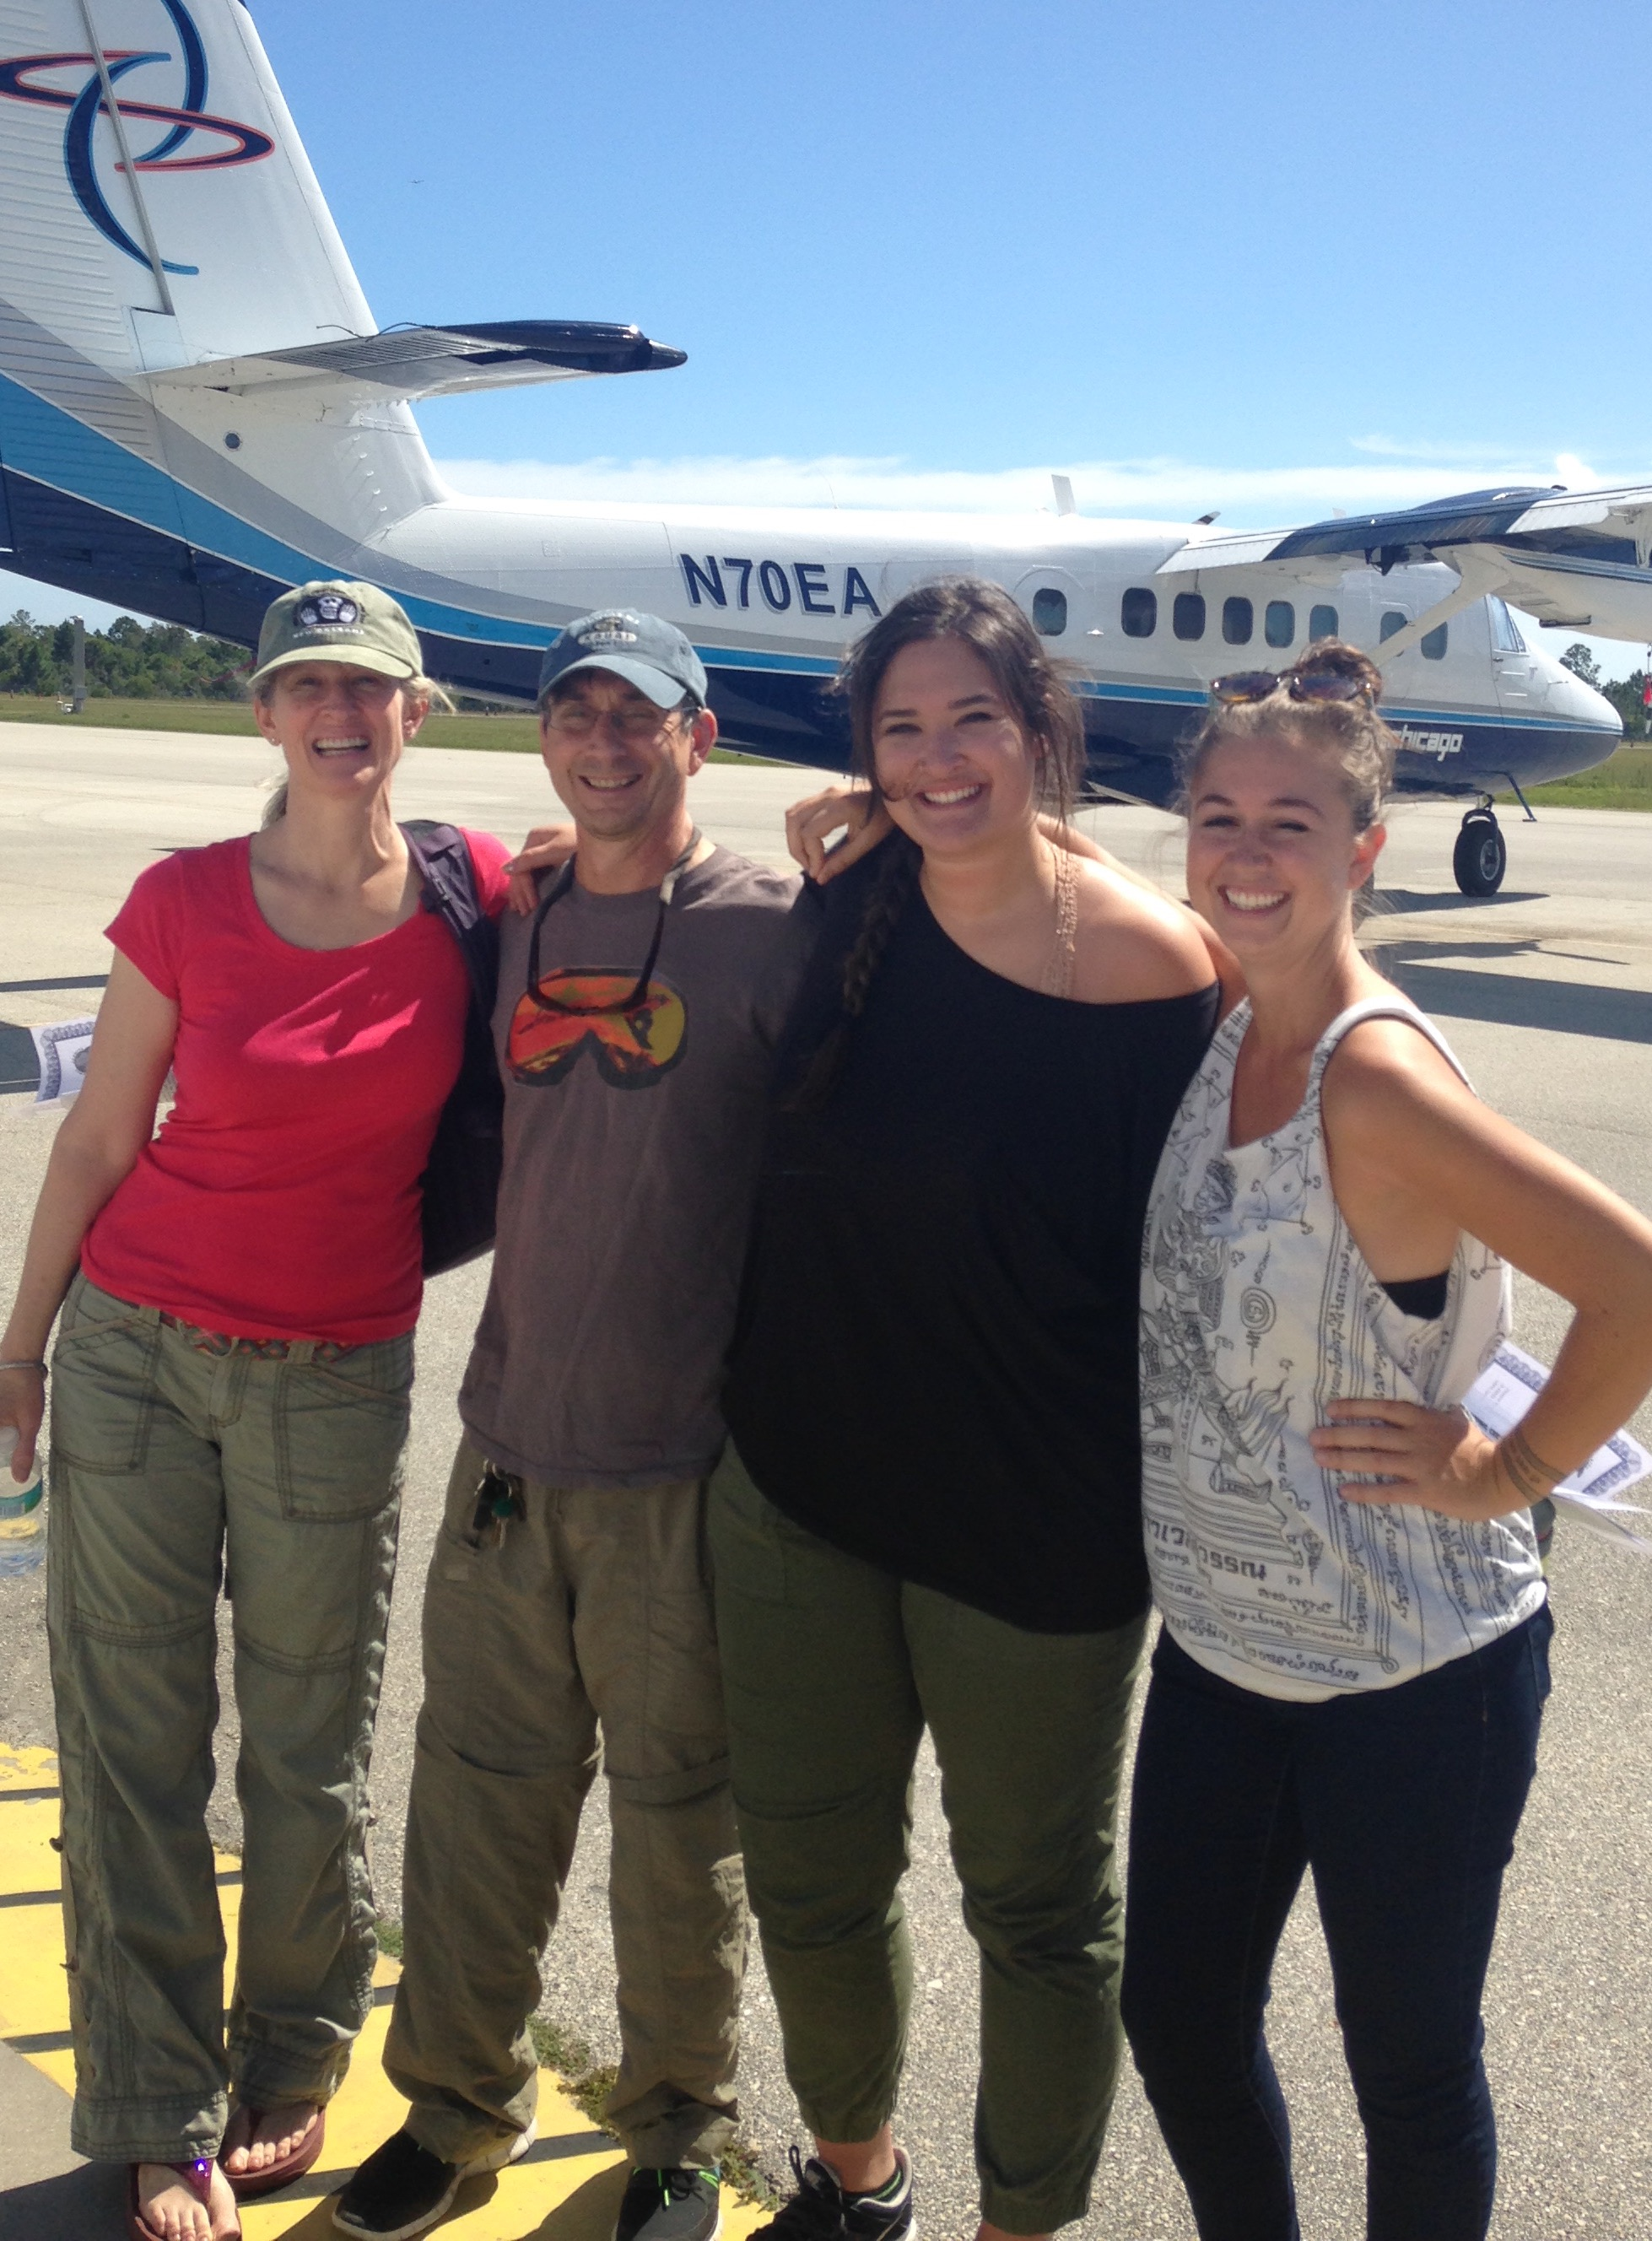 shakti-sutriasa-blog-skydiving-and-trust